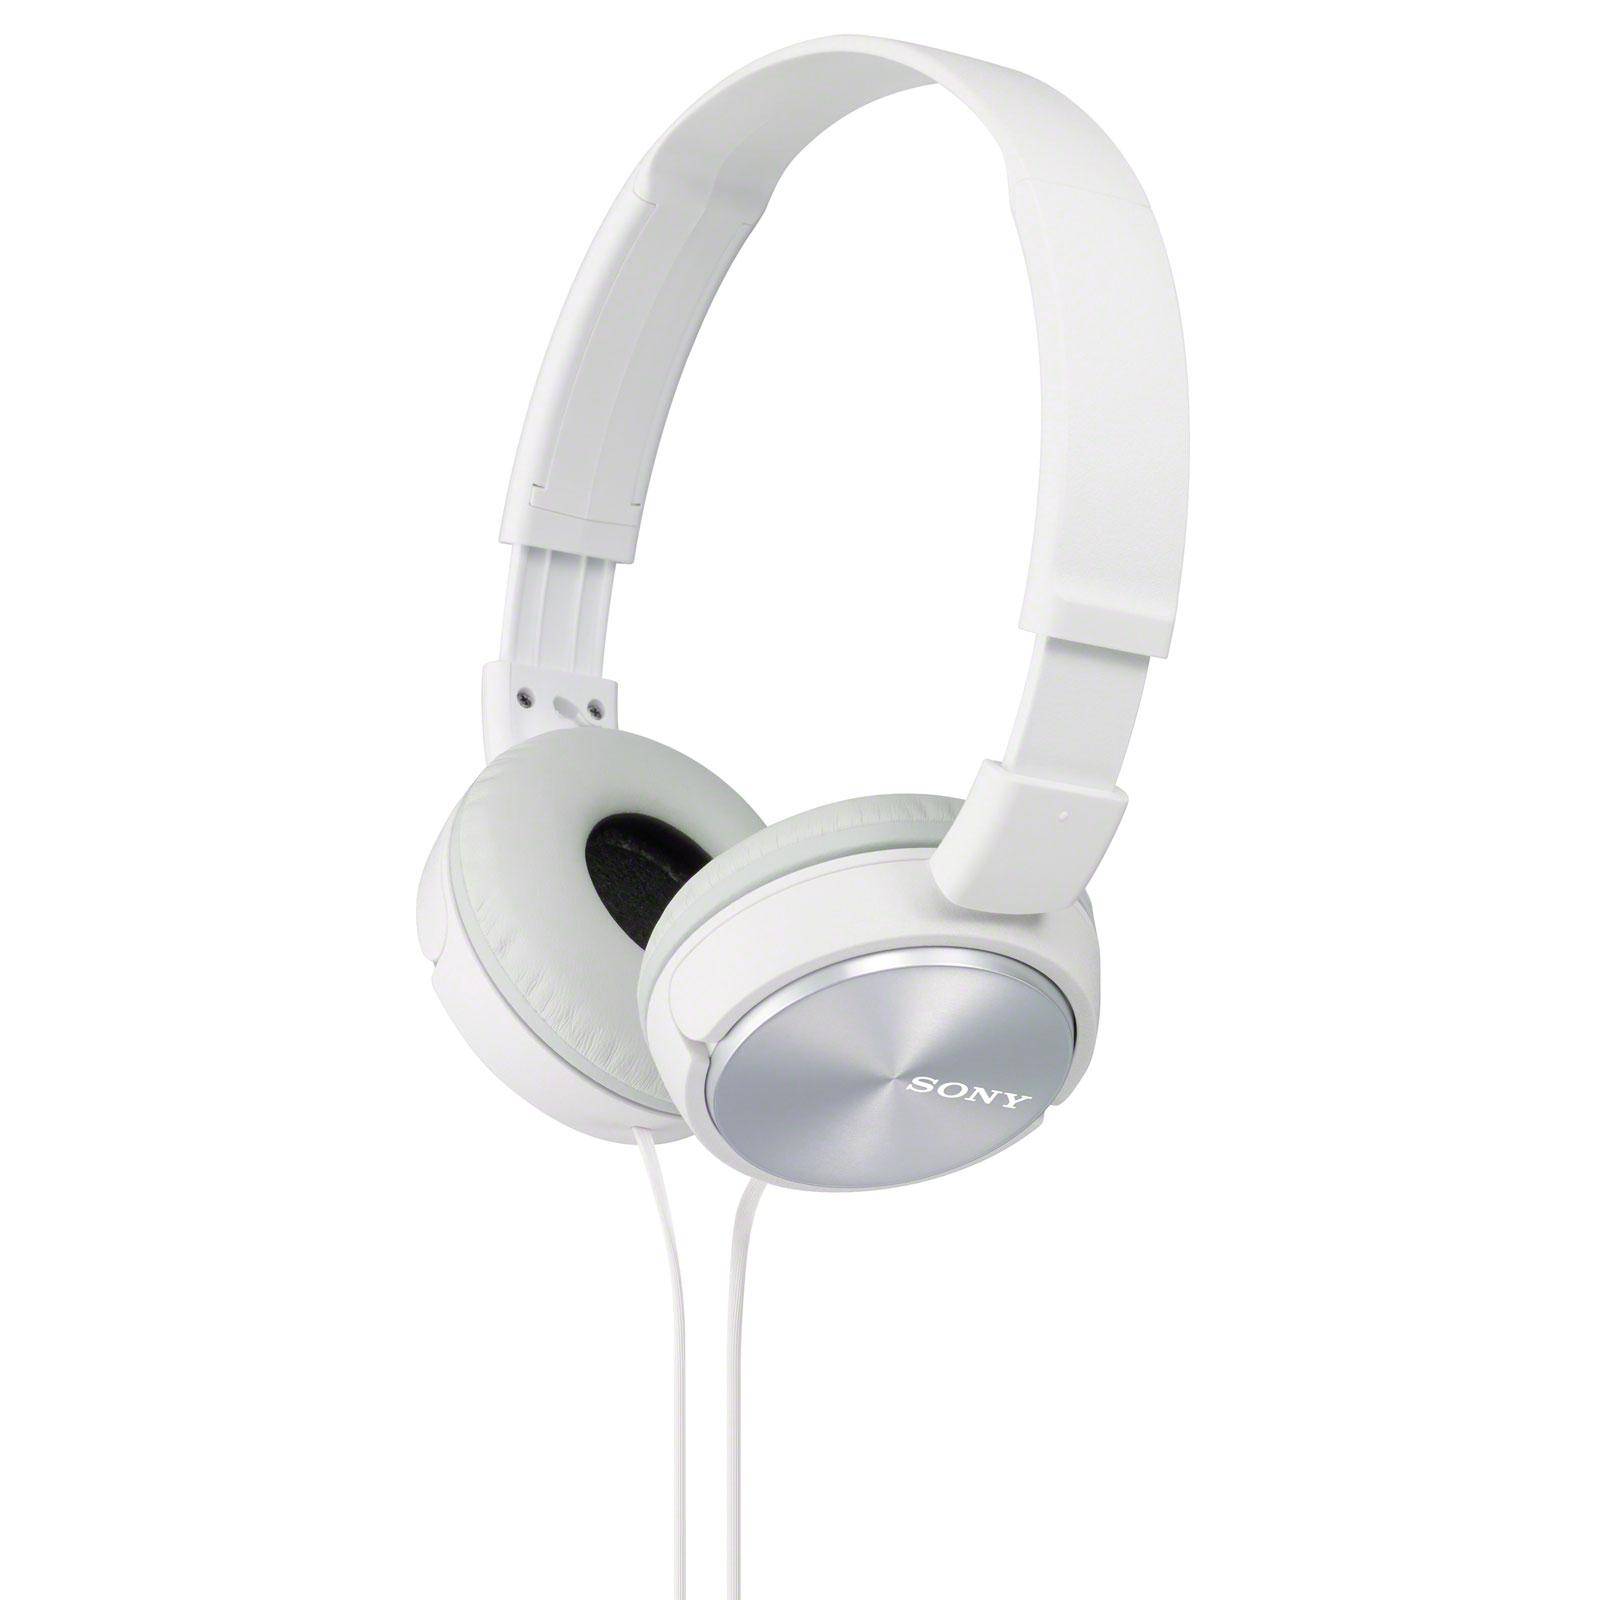 Casque Sony MDR-ZX310AP Blanc Casque supra-auriculaire fermé